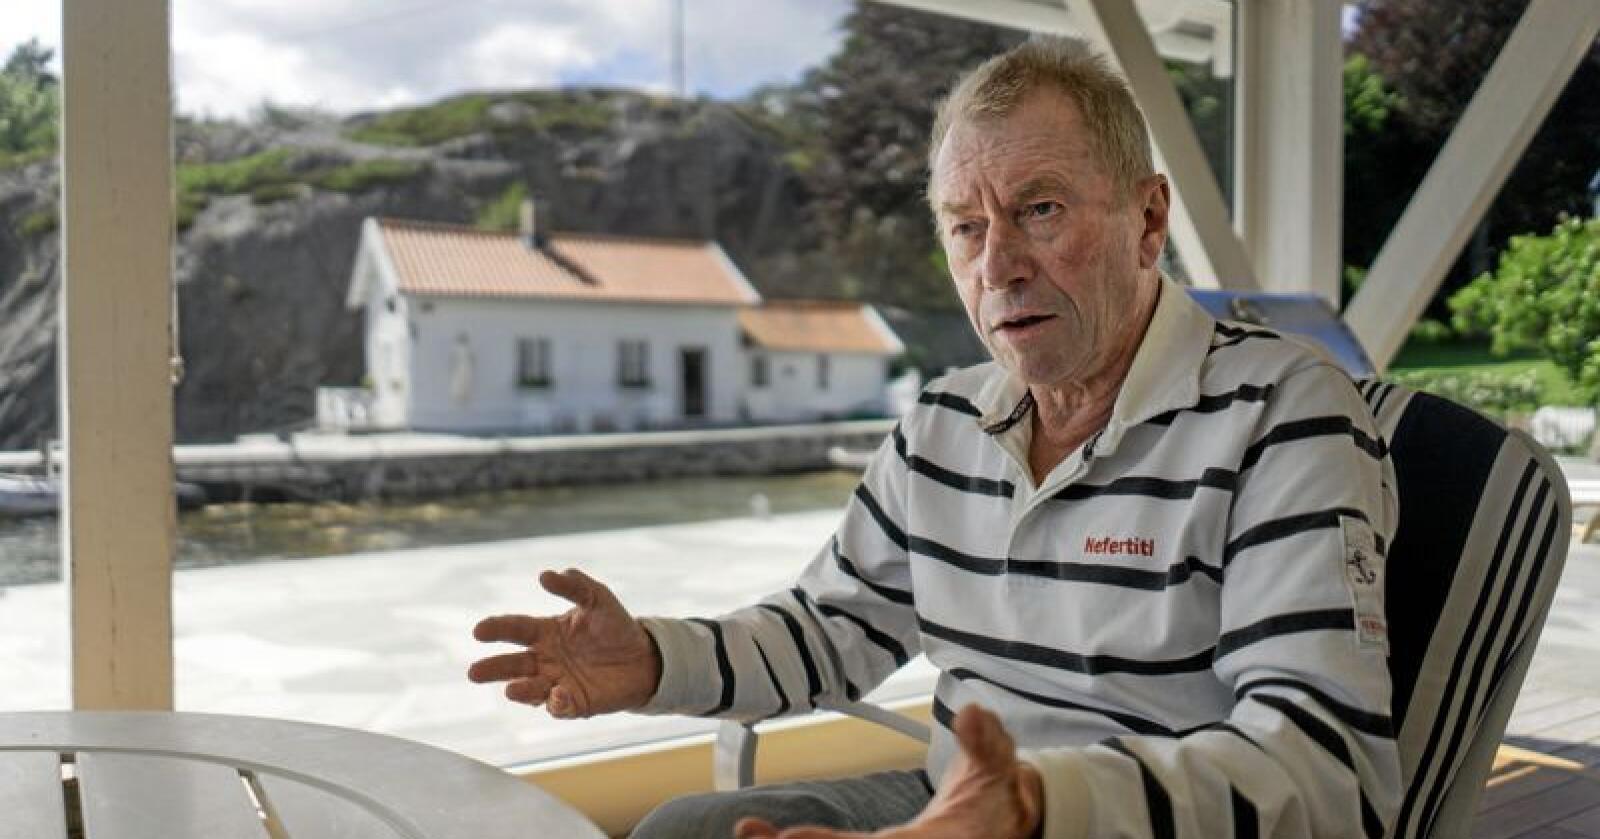 På ville veier? Investor Jens Ulltveit-Moe. Foto: Ketil Blom Haugstulen